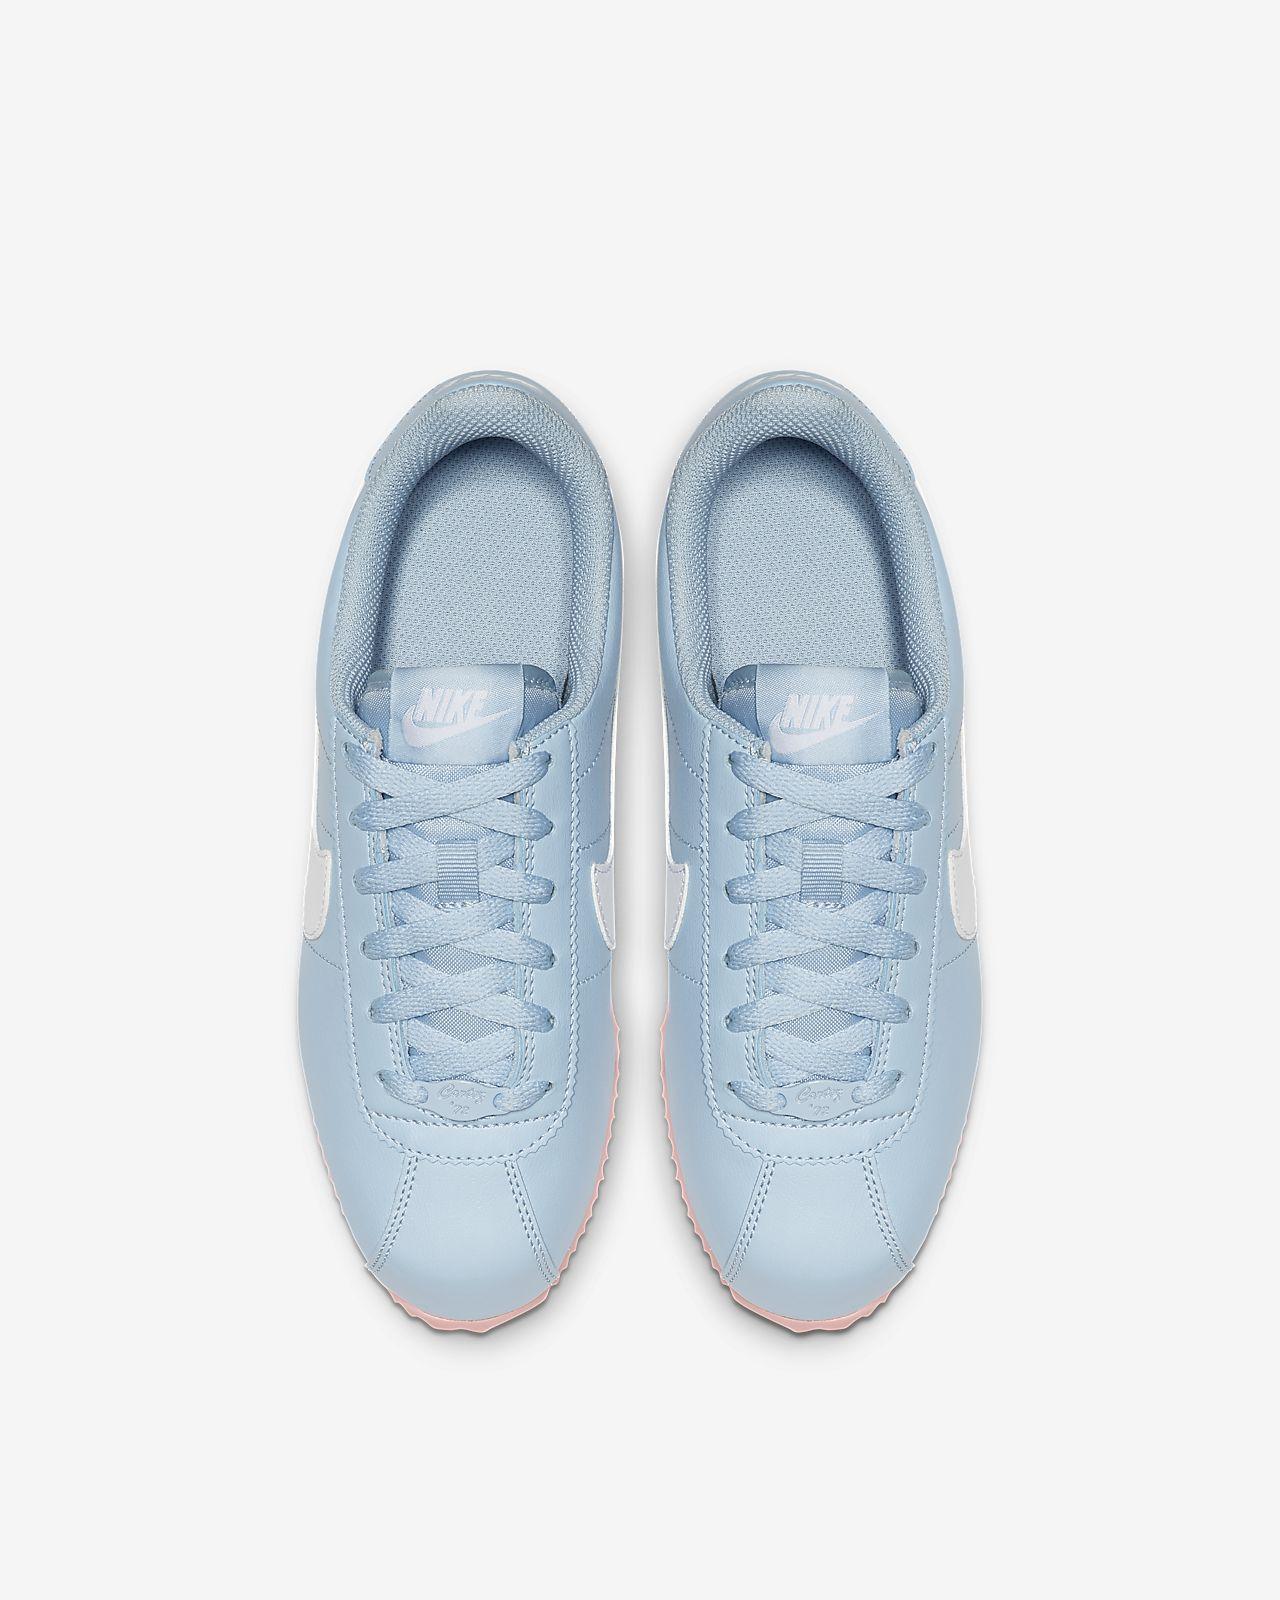 622273ec8 Nike Cortez Basic SL Big Kids  Shoe. Nike.com